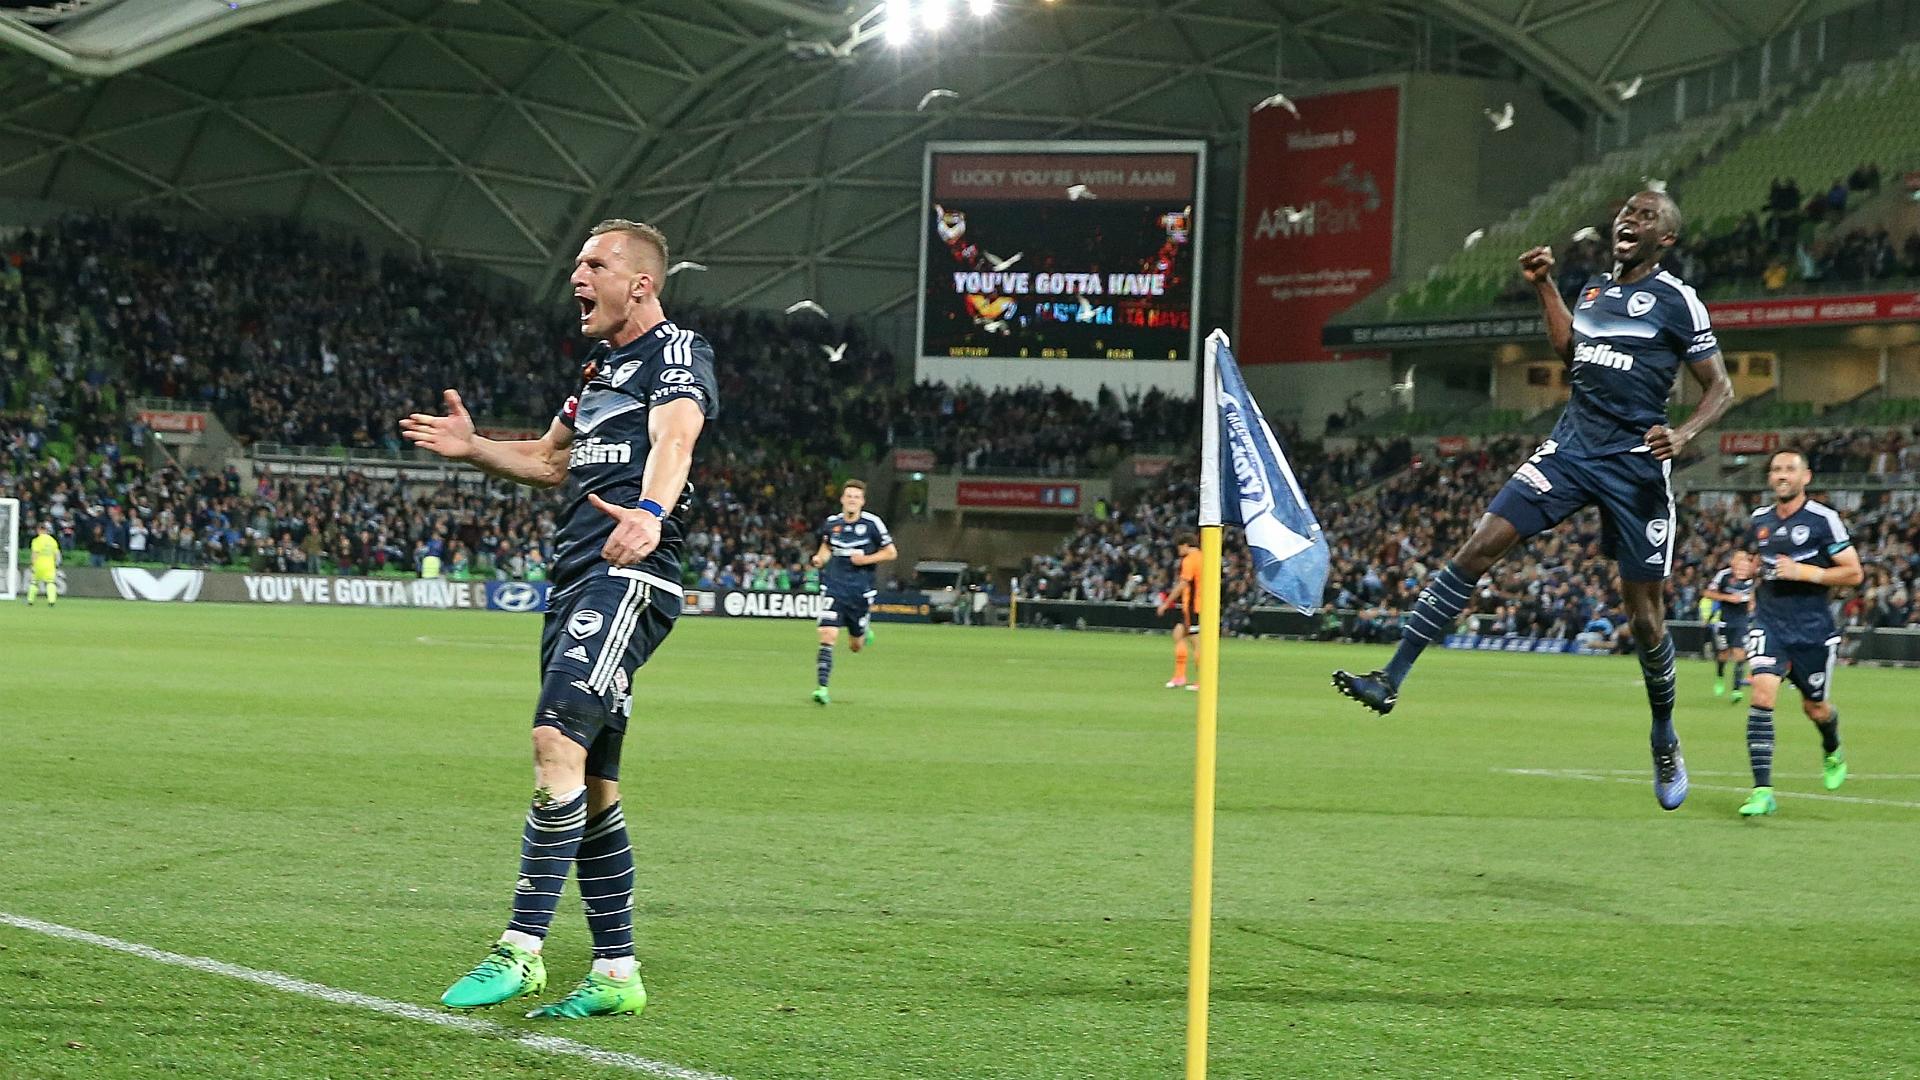 Besart Berisha Melbourne Victory v Brisbane Roar A-League 30042017